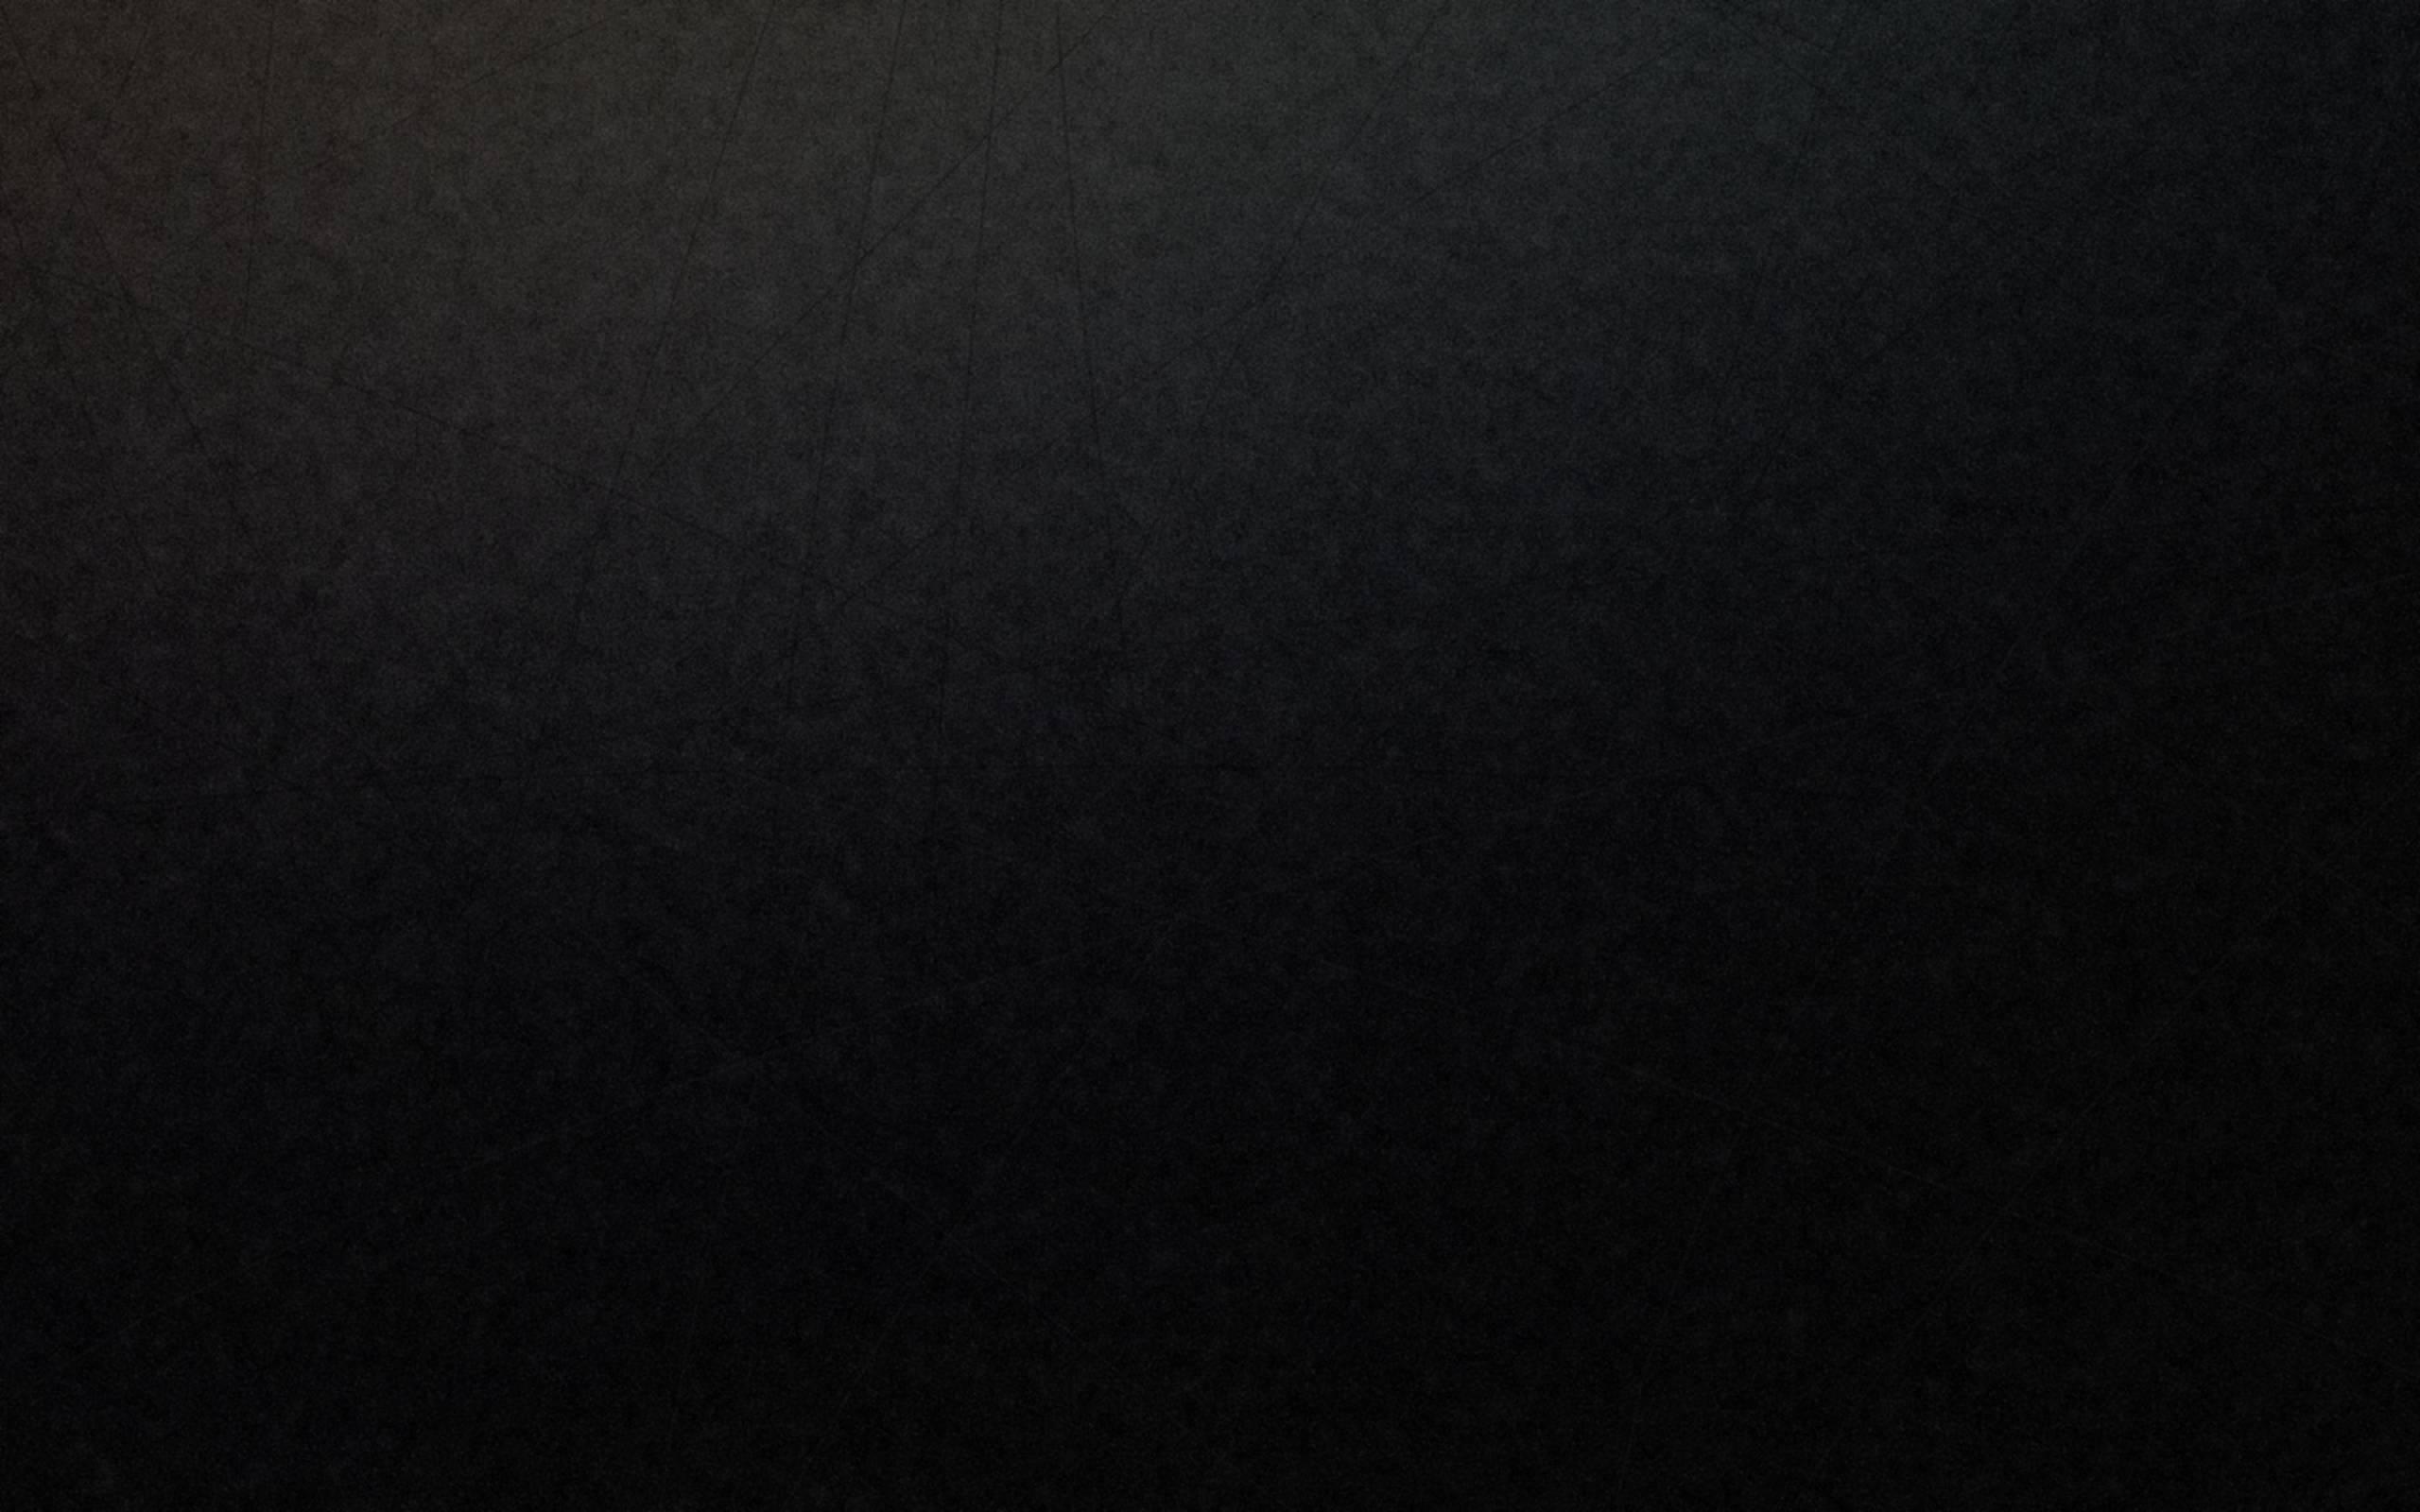 black charcoal texture wallpaper textures pinterest